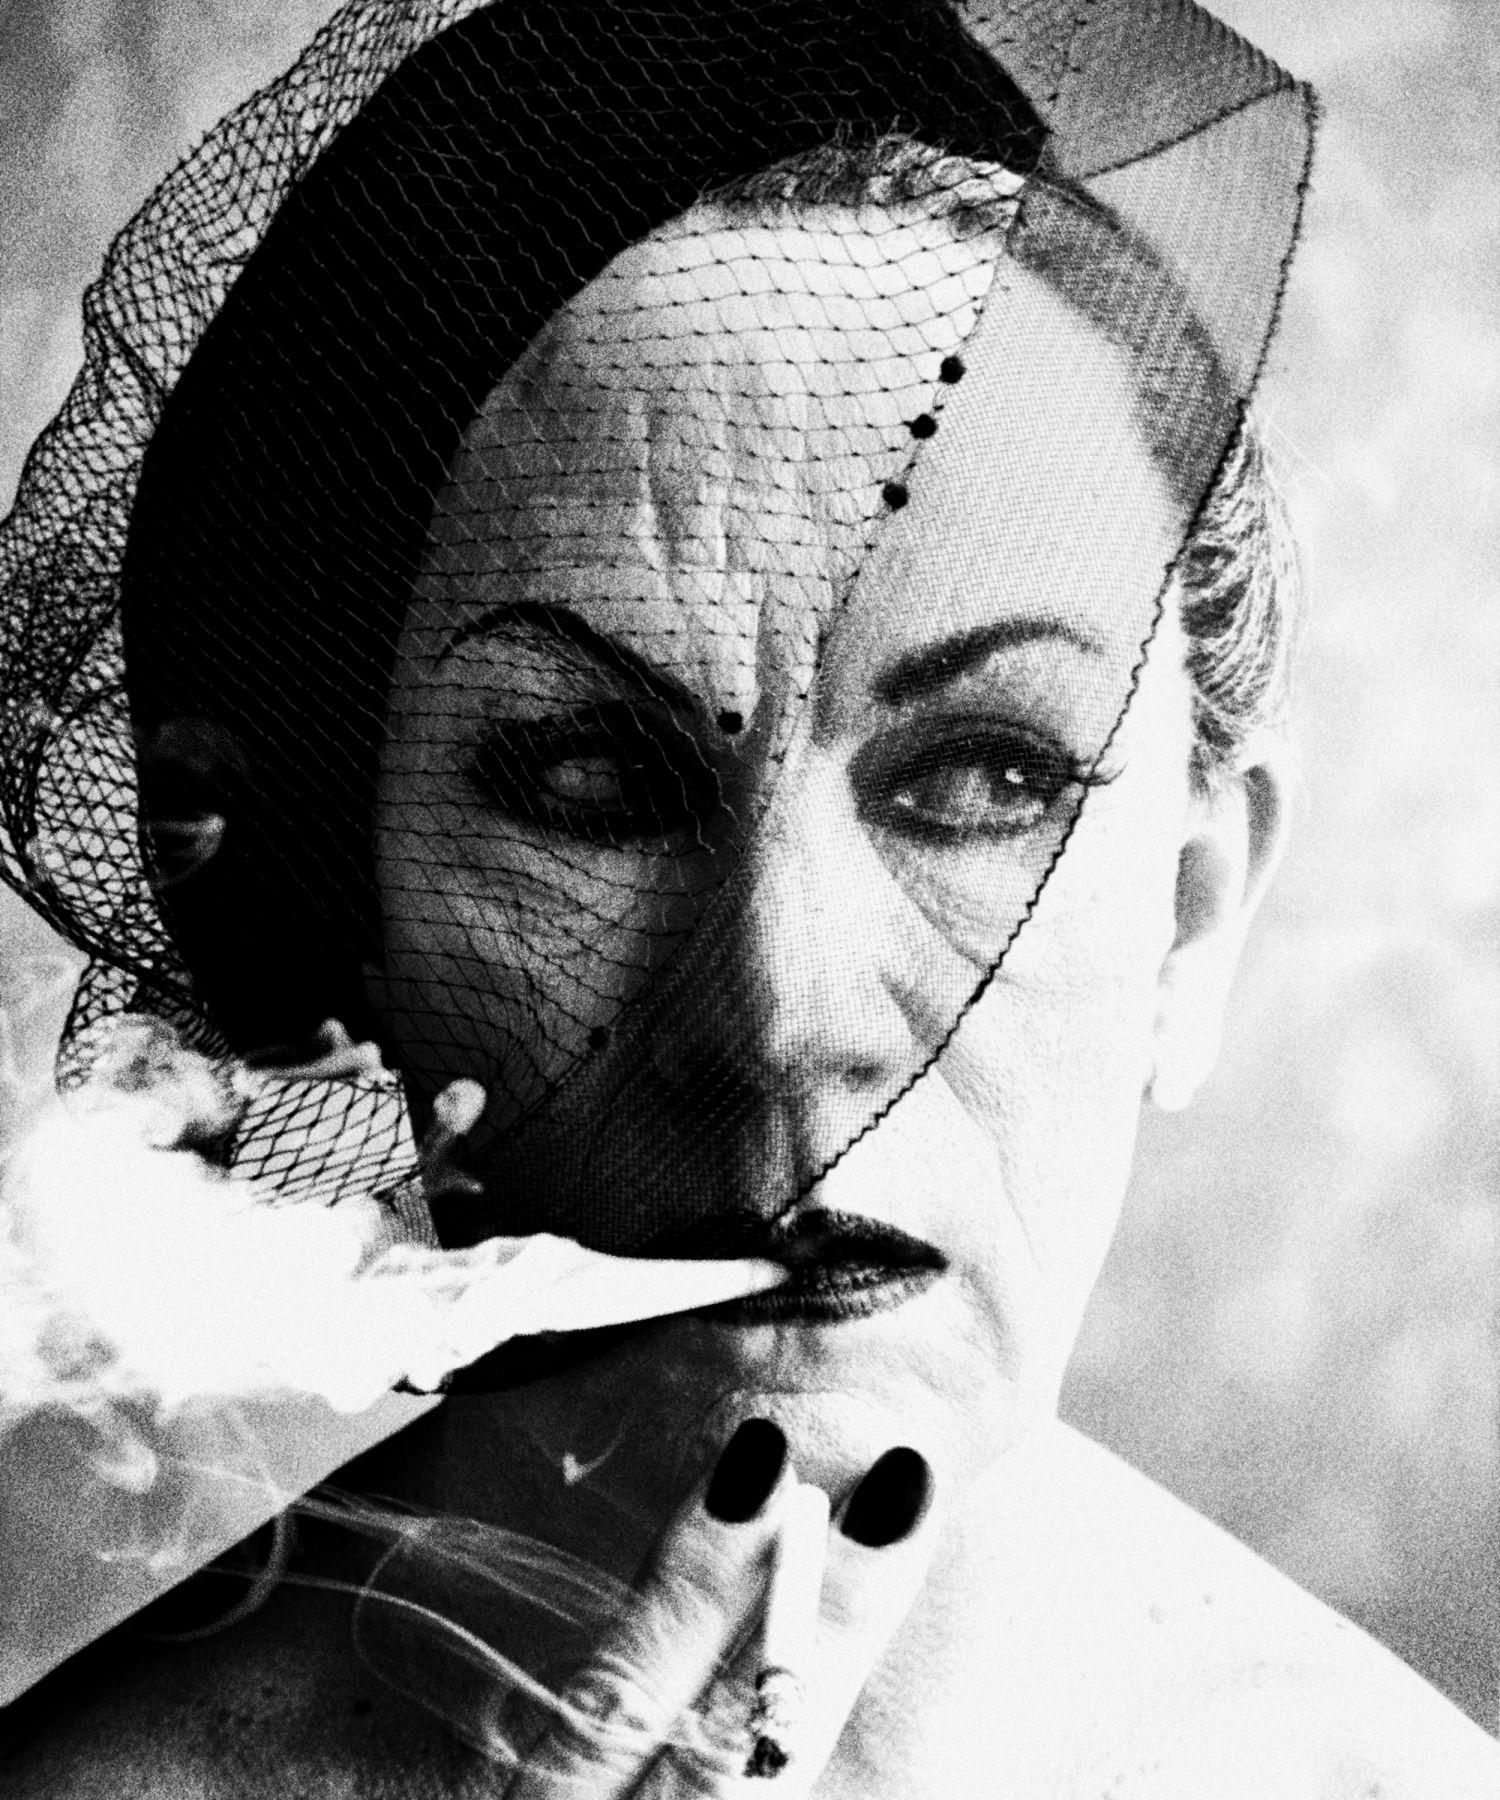 William Klein / Smoke and Veil, Paris (Vogue 1958), 2014